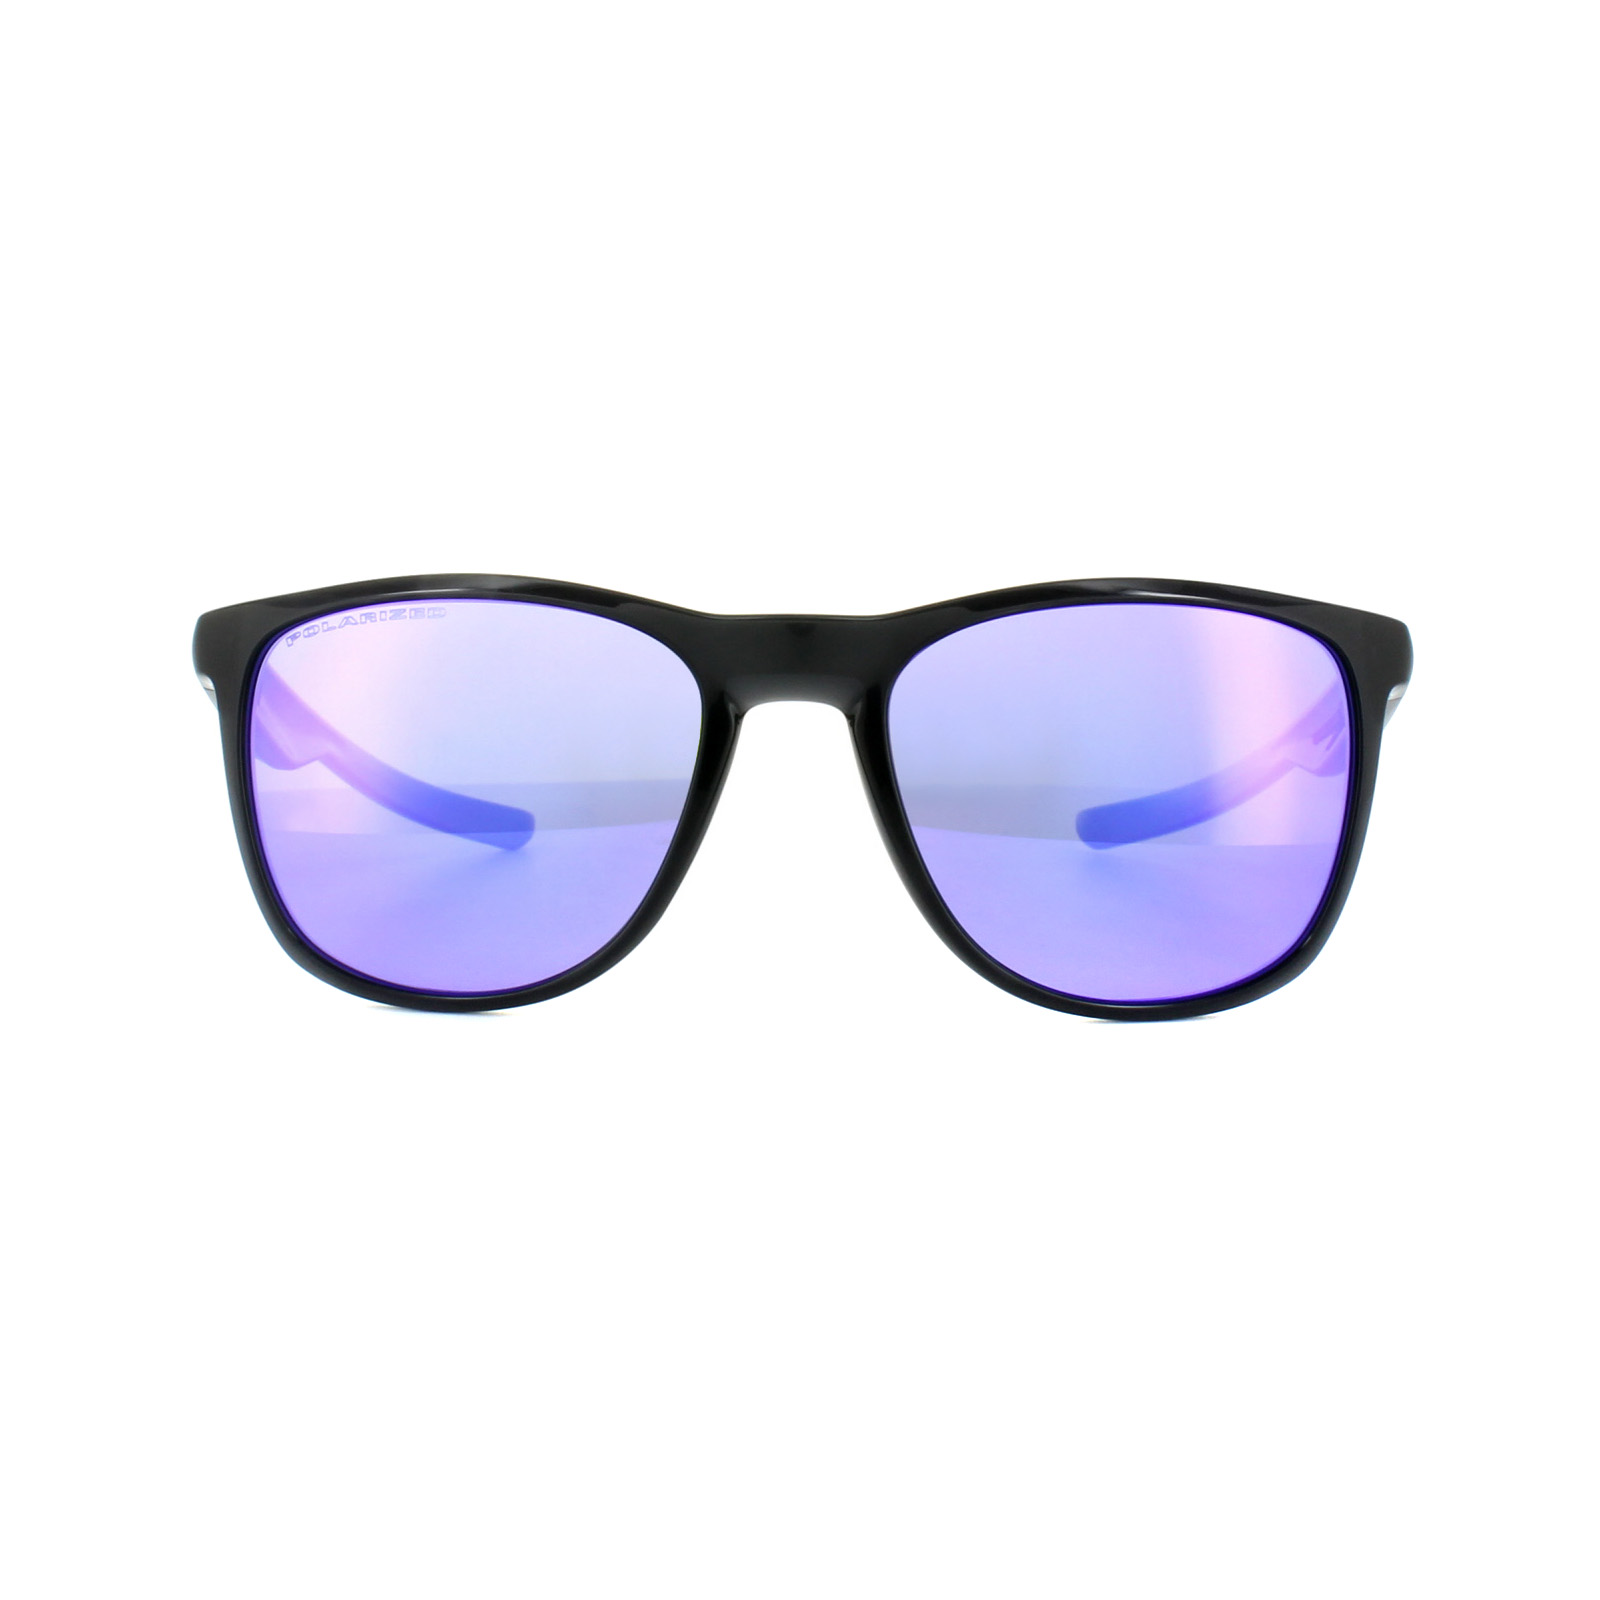 91d585801c0 CENTINELA Oakley gafas de sol Trillbe X OO9340-03 negro tinta violeta  Iridium polarizada